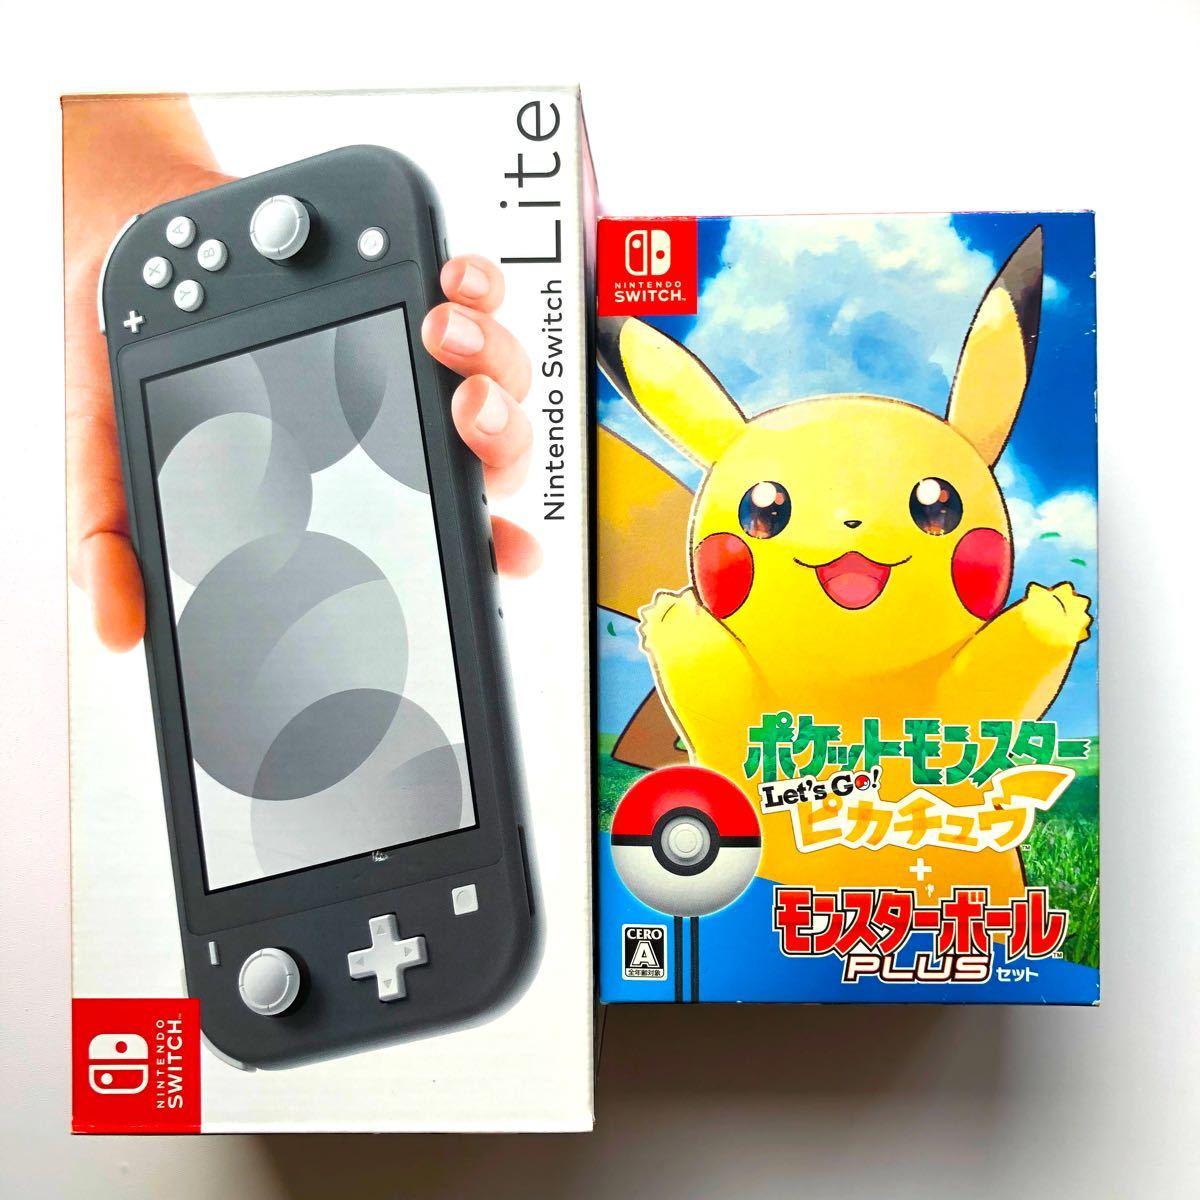 Switch ライト & ポケモン Let's go ピカチュウ ソフト